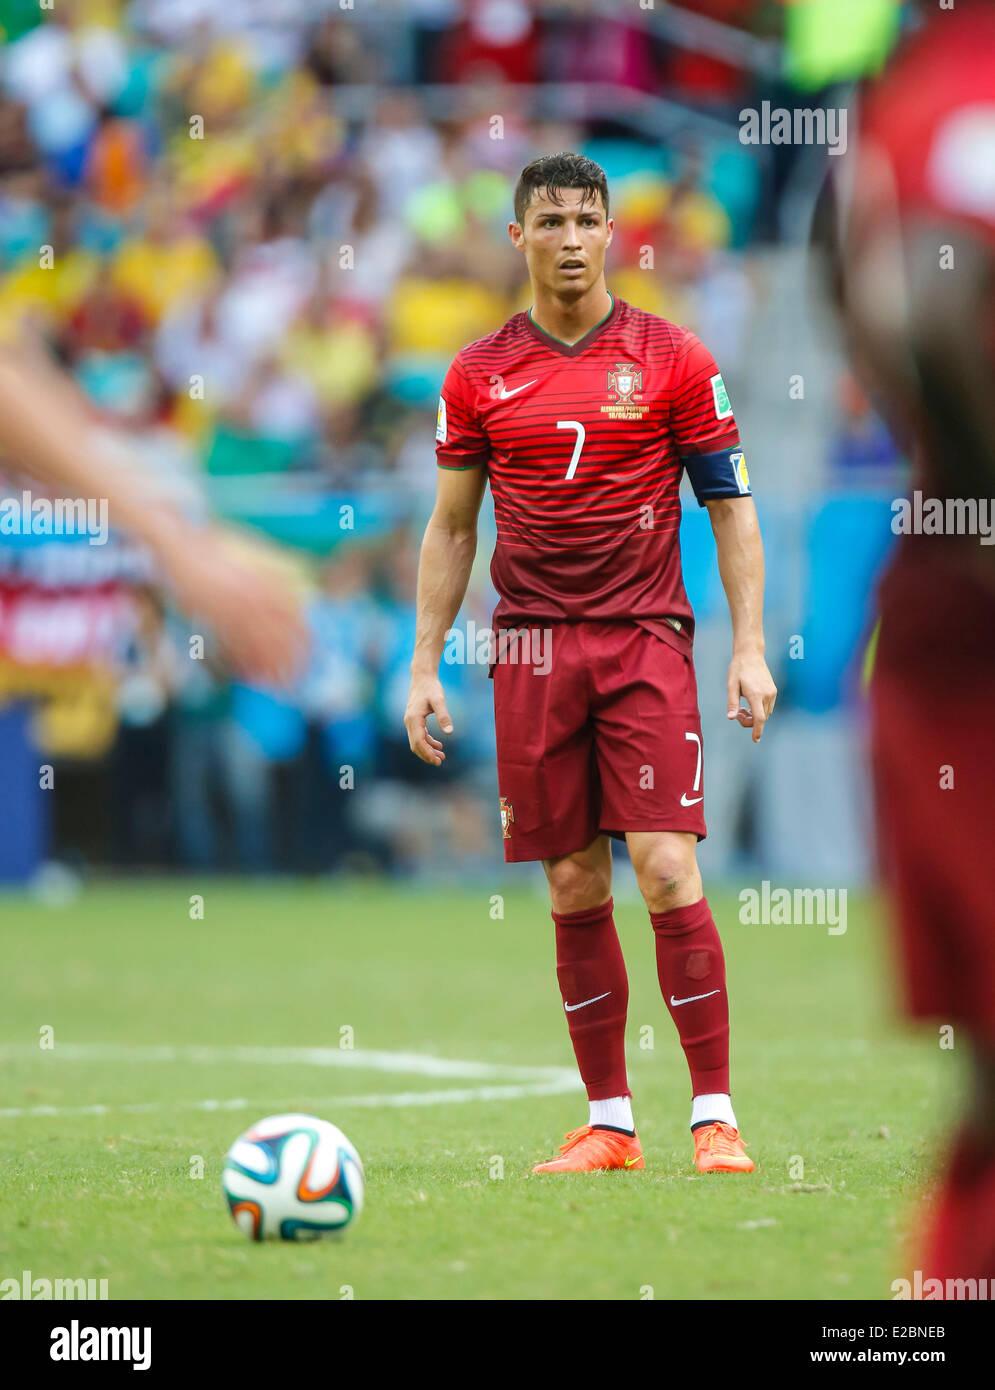 Salvador Brazil 16th June 2014 Cristiano Ronaldo Por 7